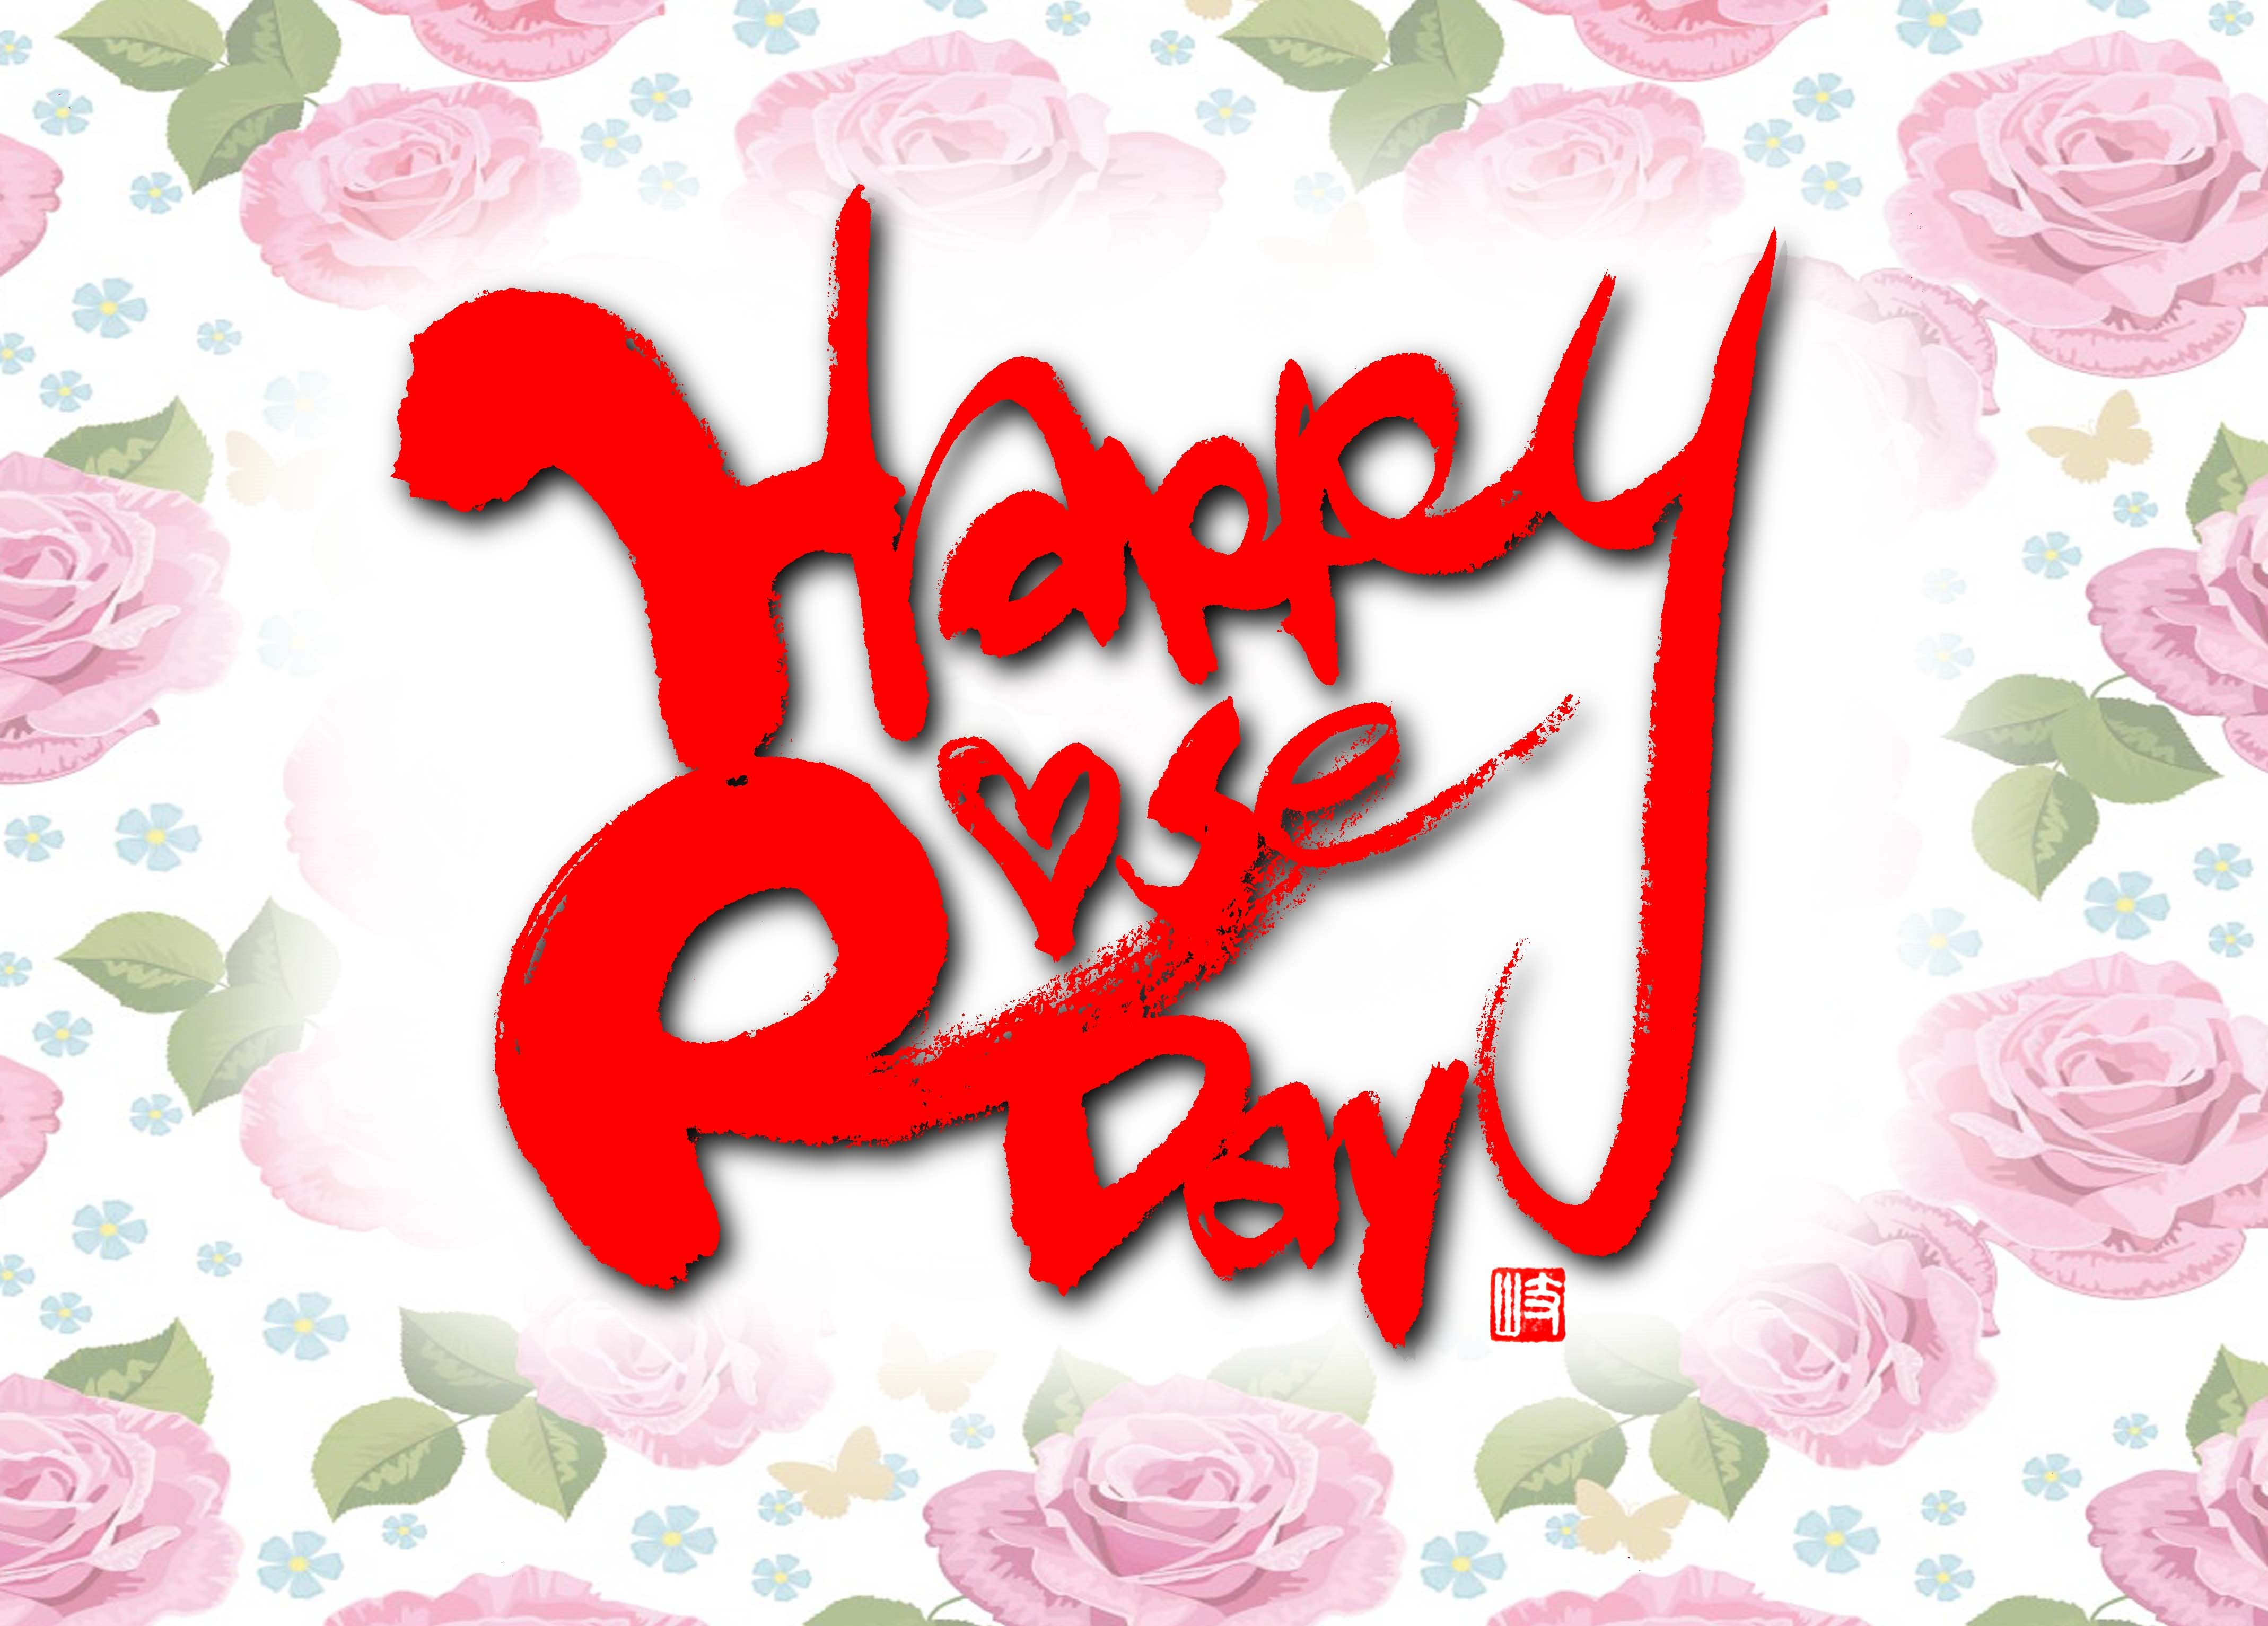 HappyRoseDay ローズの日 ロゴ2014.4赤塚このみ様